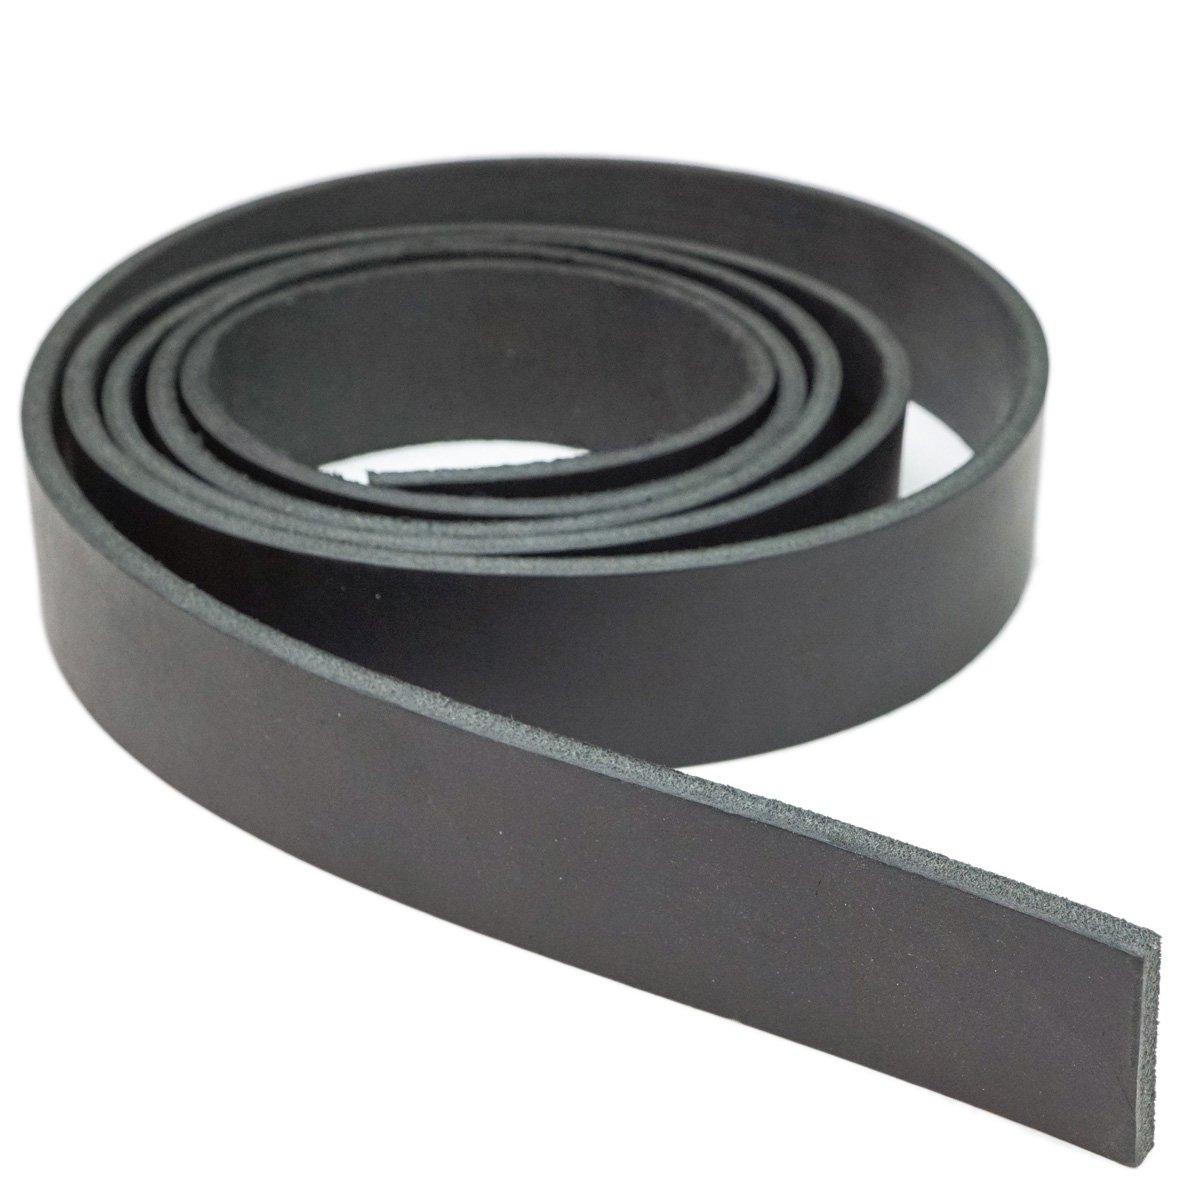 Springfield Leather Company Black Latigo Leather Strip 5.1cm x 210cm B00EBE7UJ0 ブラック 2\